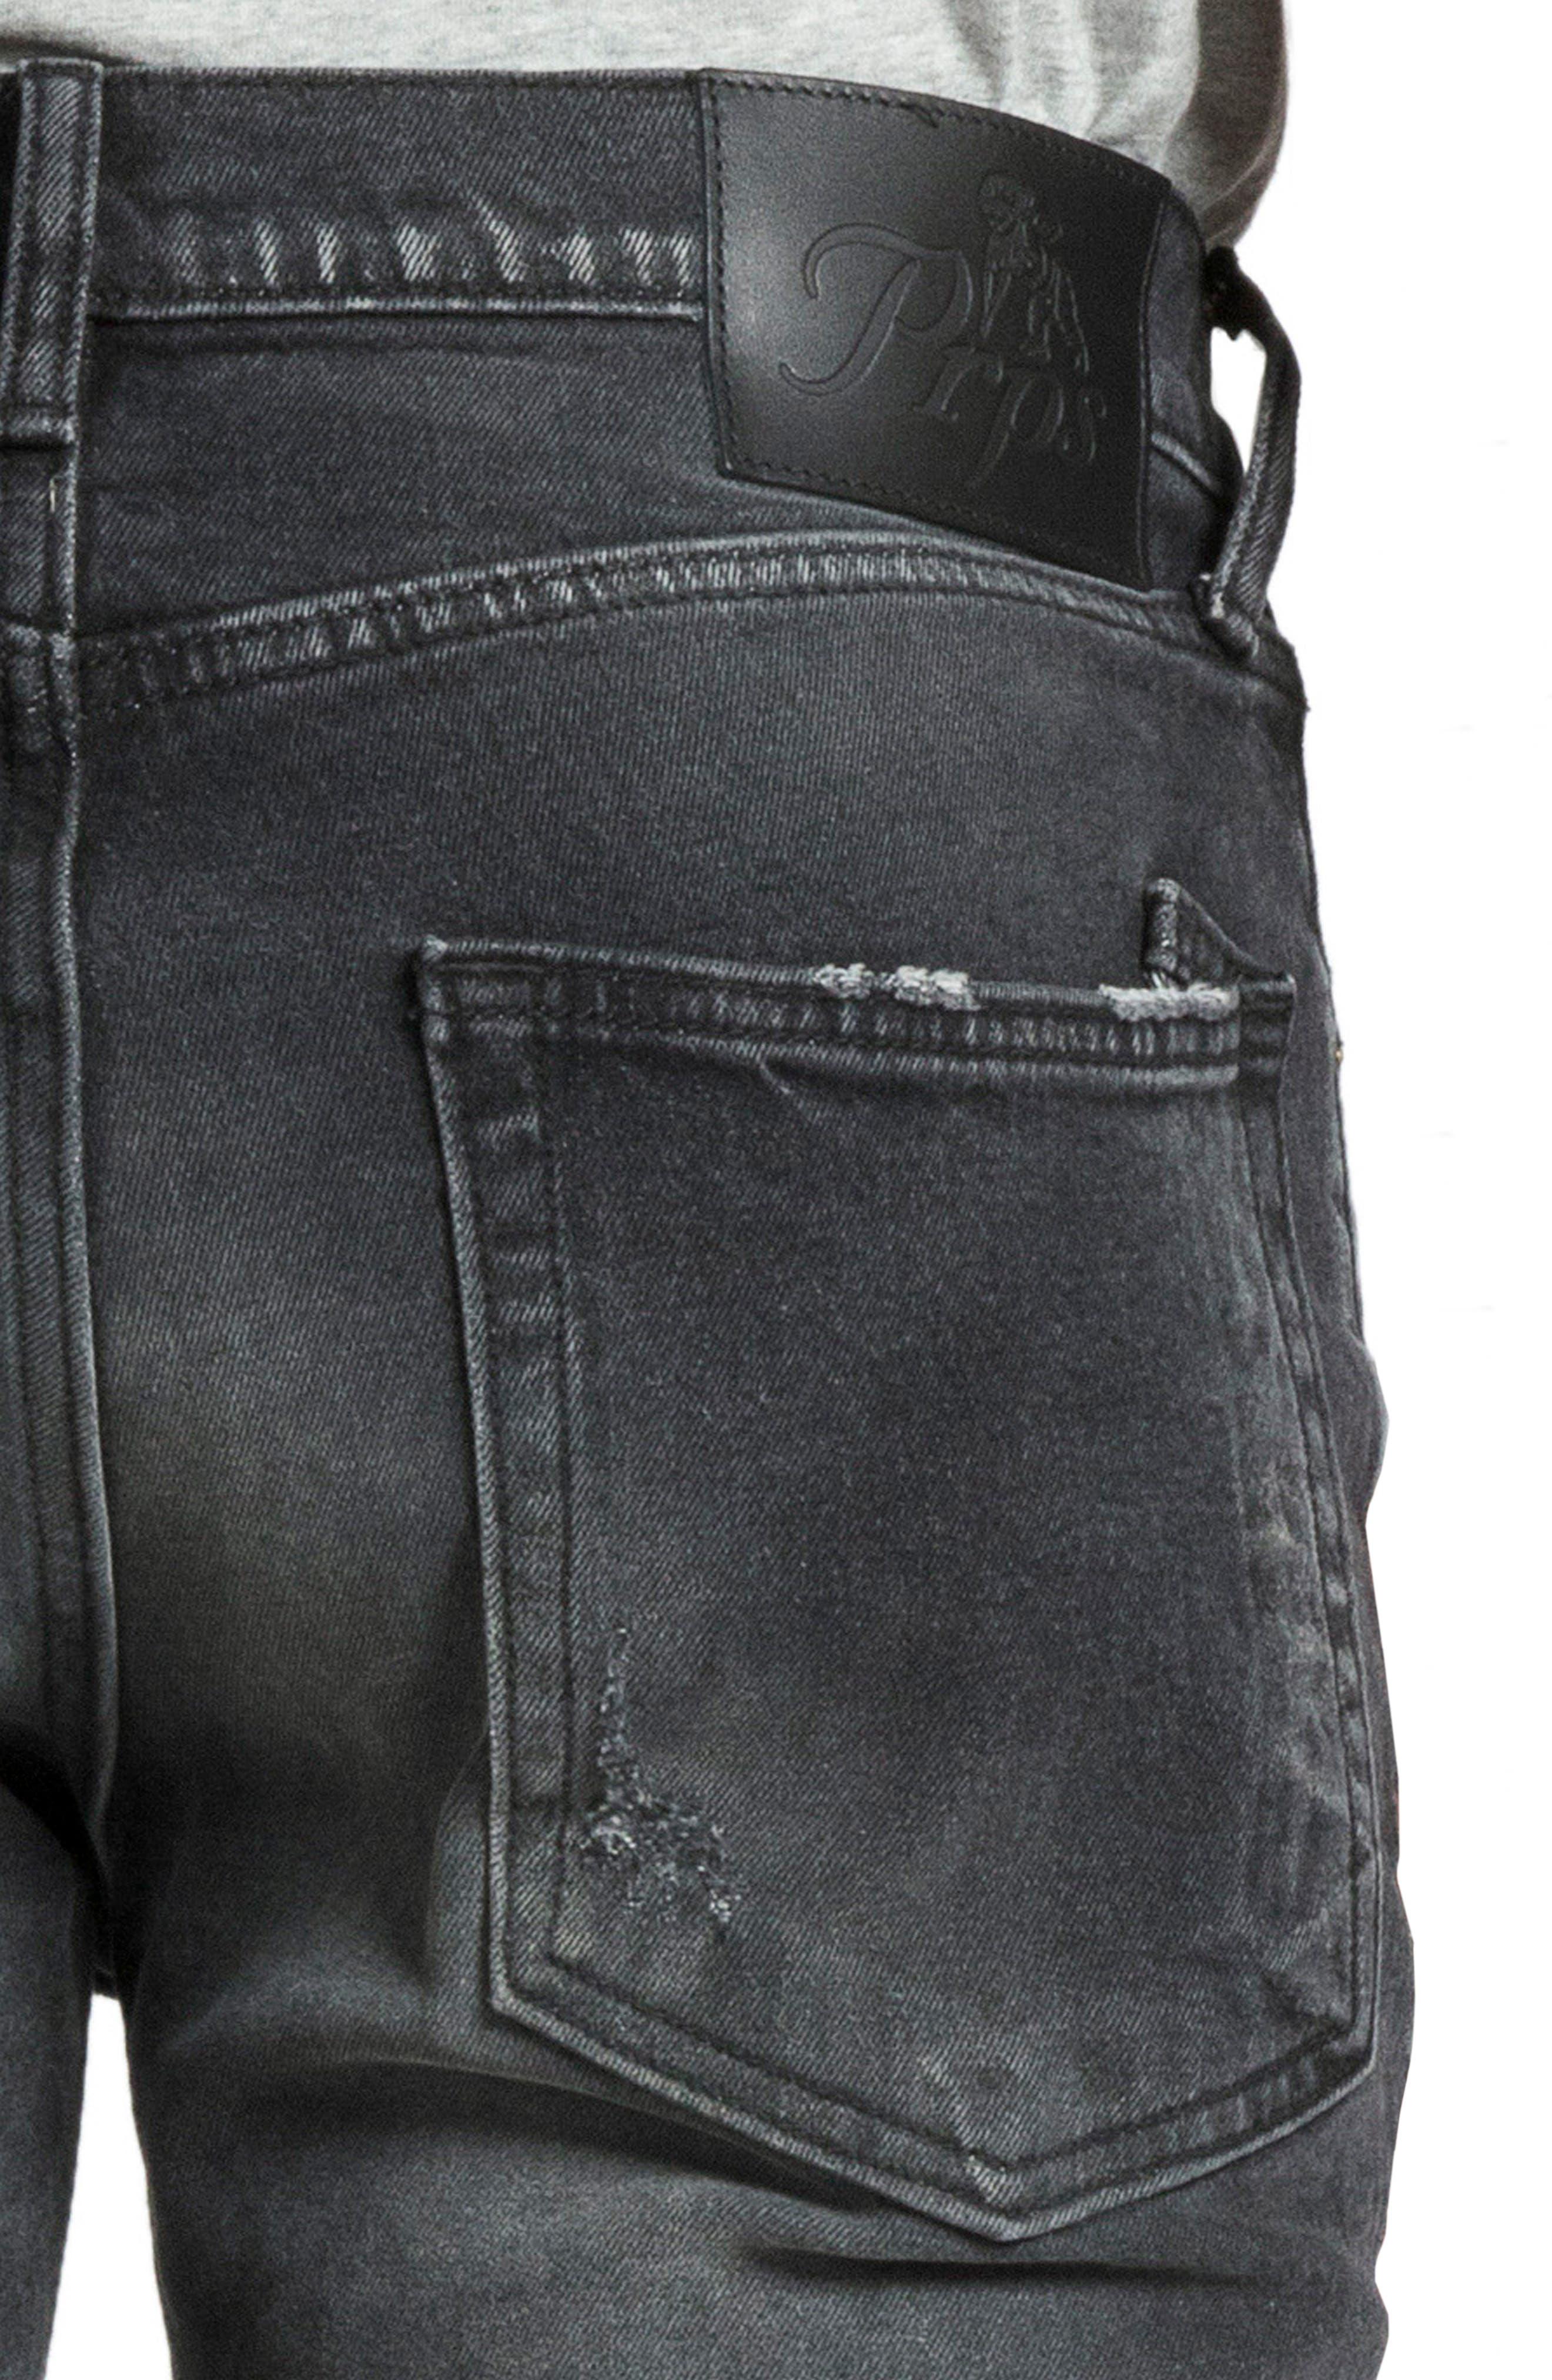 Windsor Skinny Fit Jeans,                             Alternate thumbnail 4, color,                             RESOLUTE